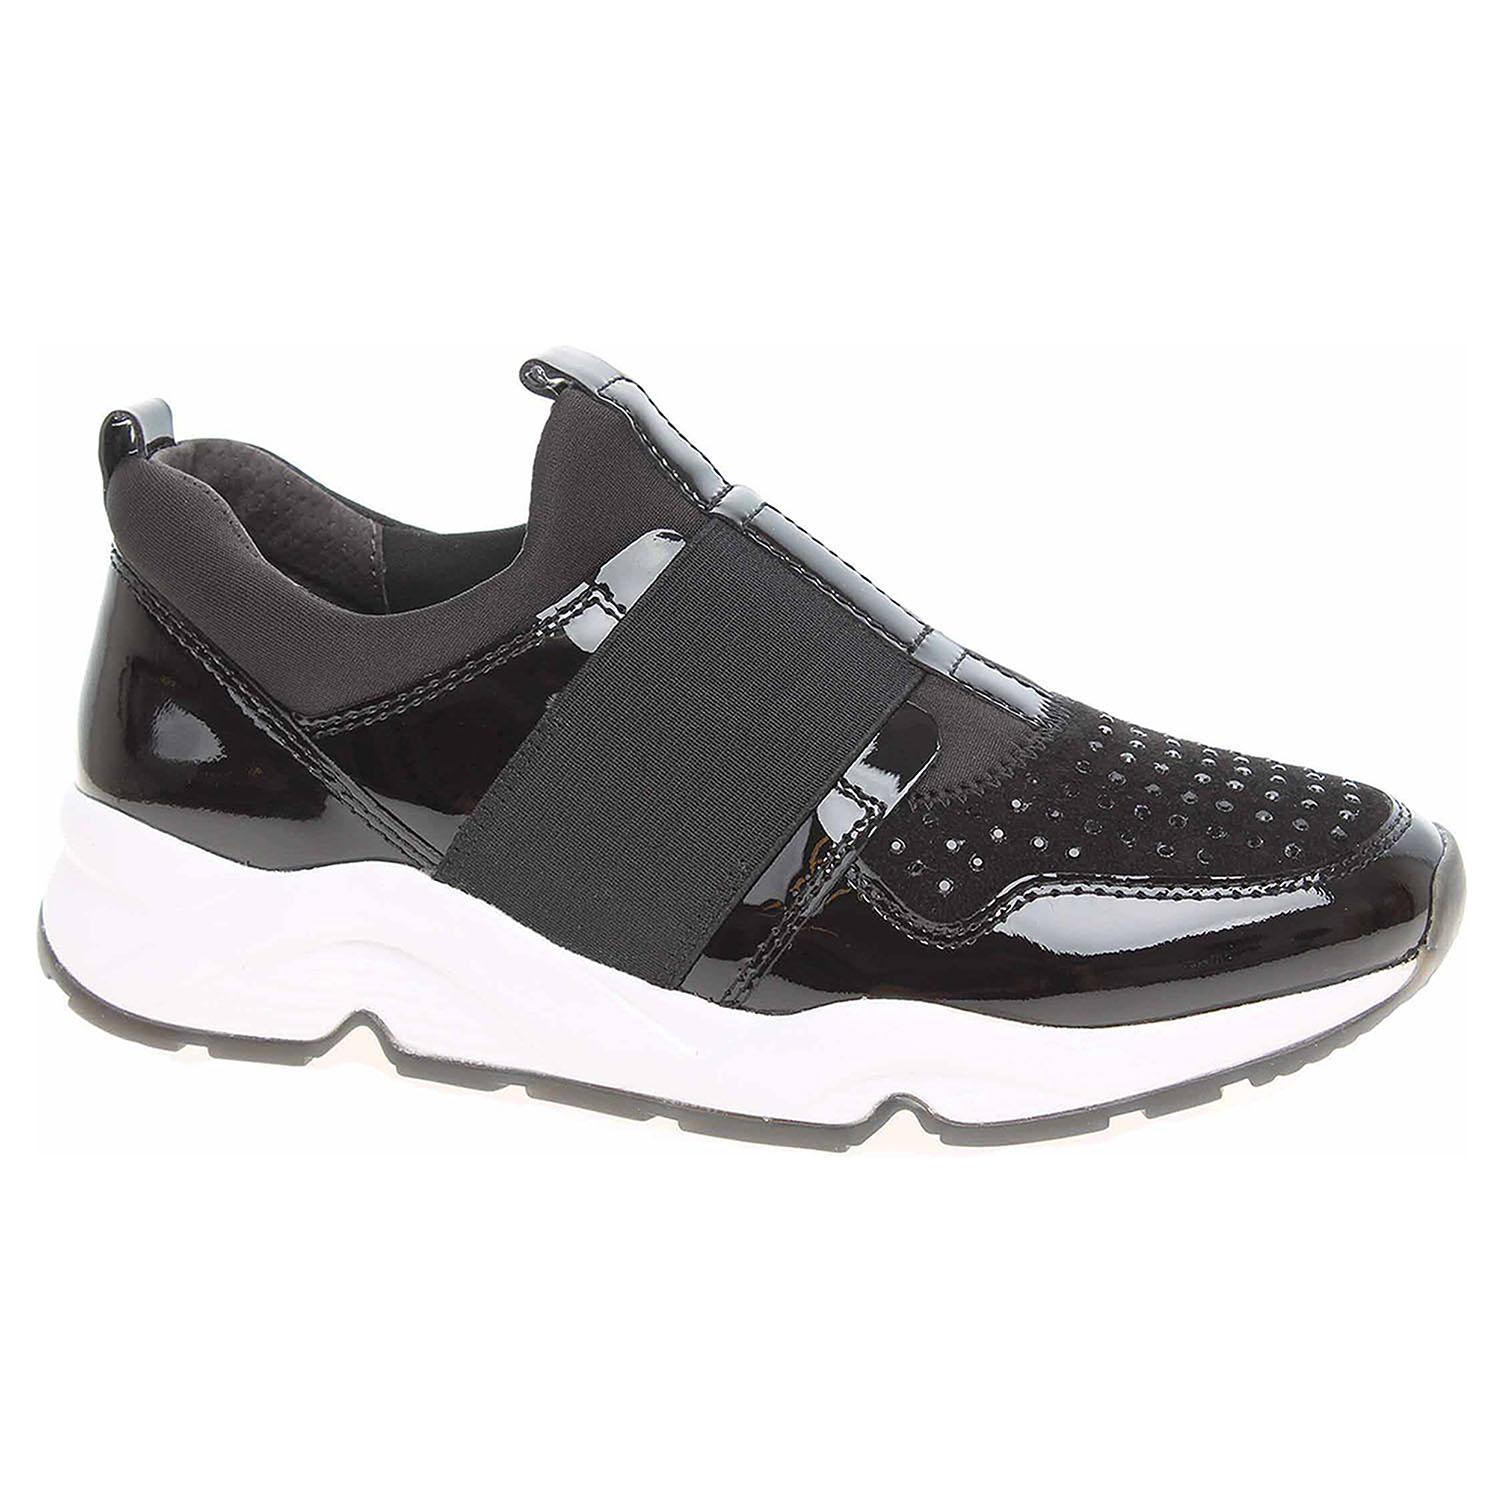 Dámská obuv Gabor 76.321.97 černá 76.321.97 40